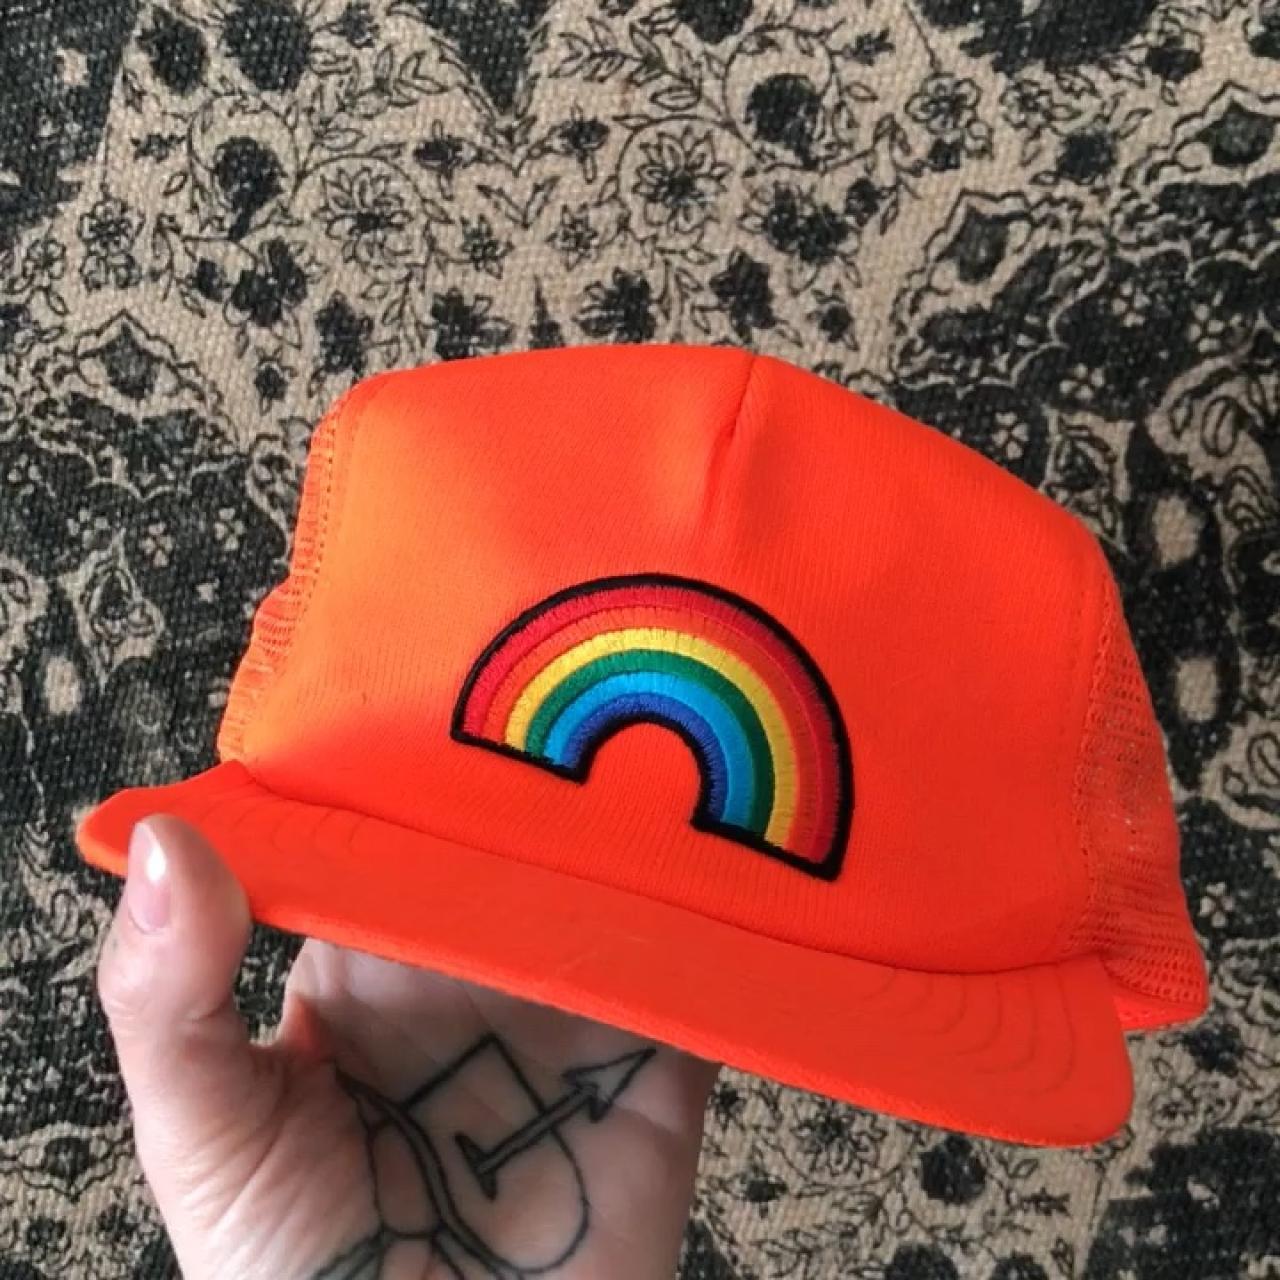 ccd0bfd79c8 Vintage rainbow trucker hat. It  in good vintage condition. - Depop